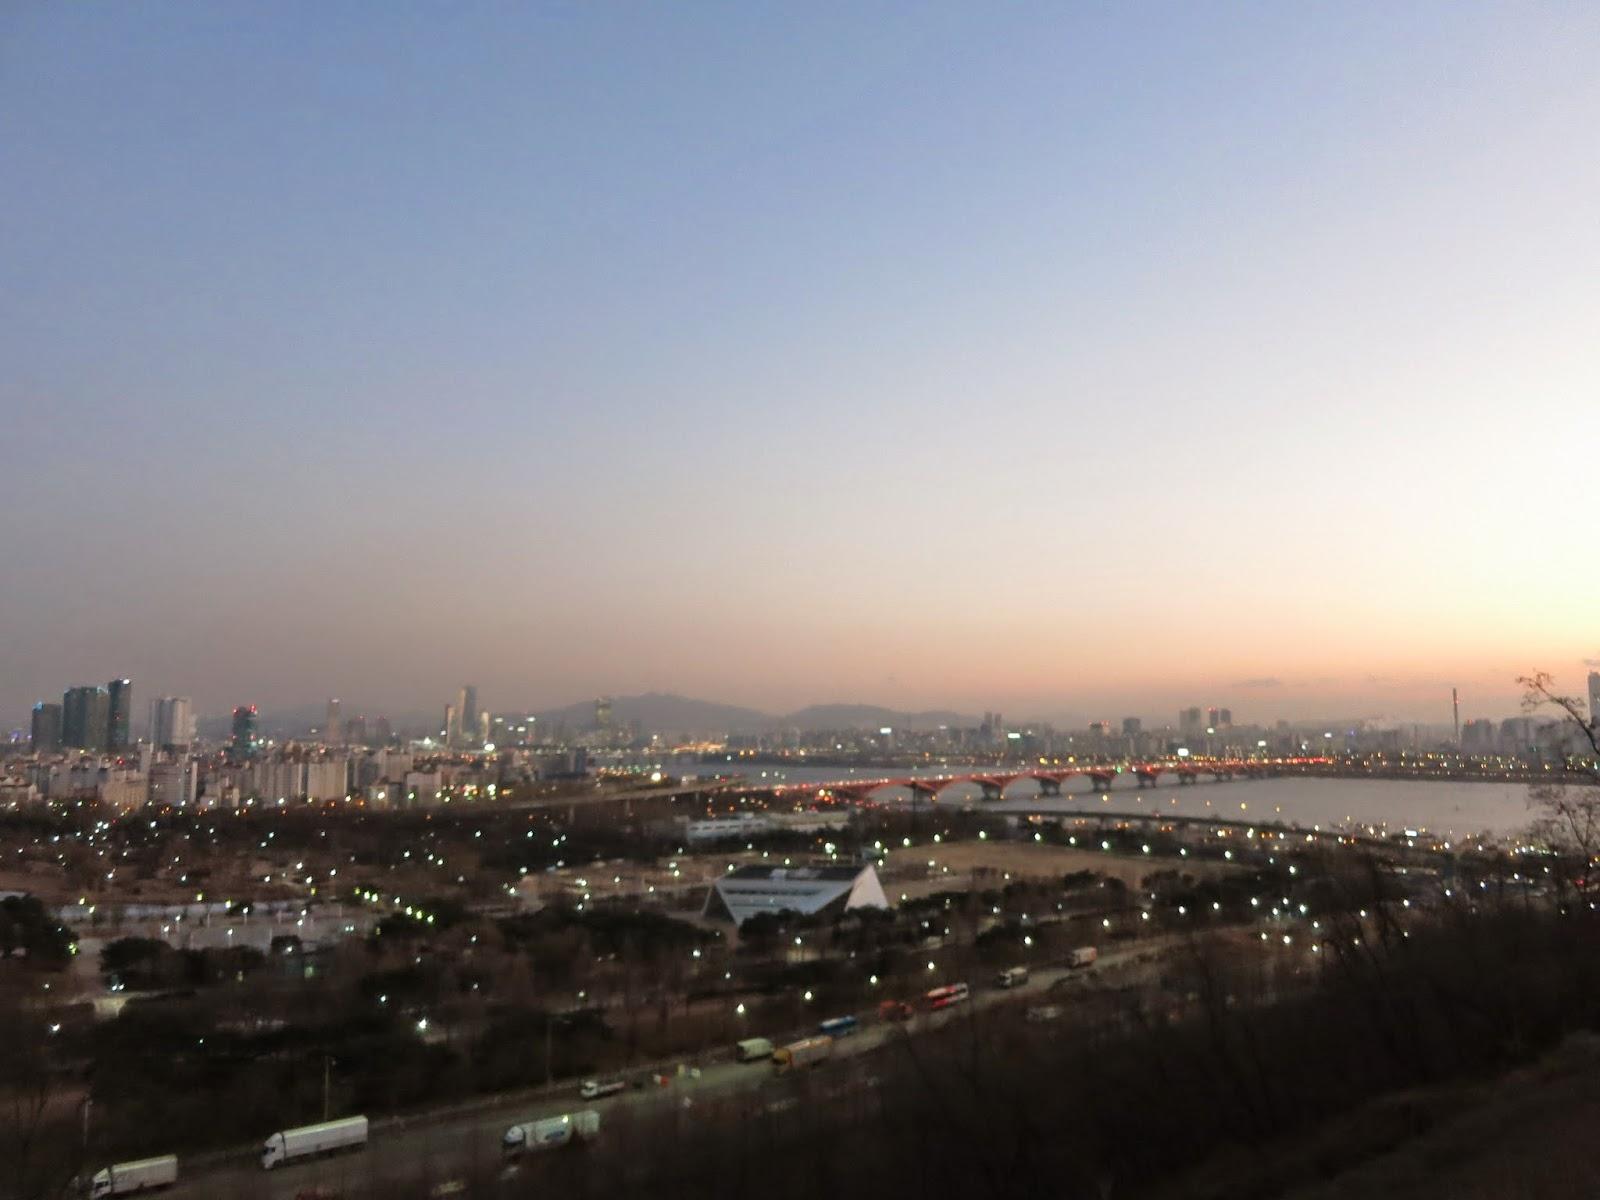 Hanuel Park (Sky Park) - Seoul